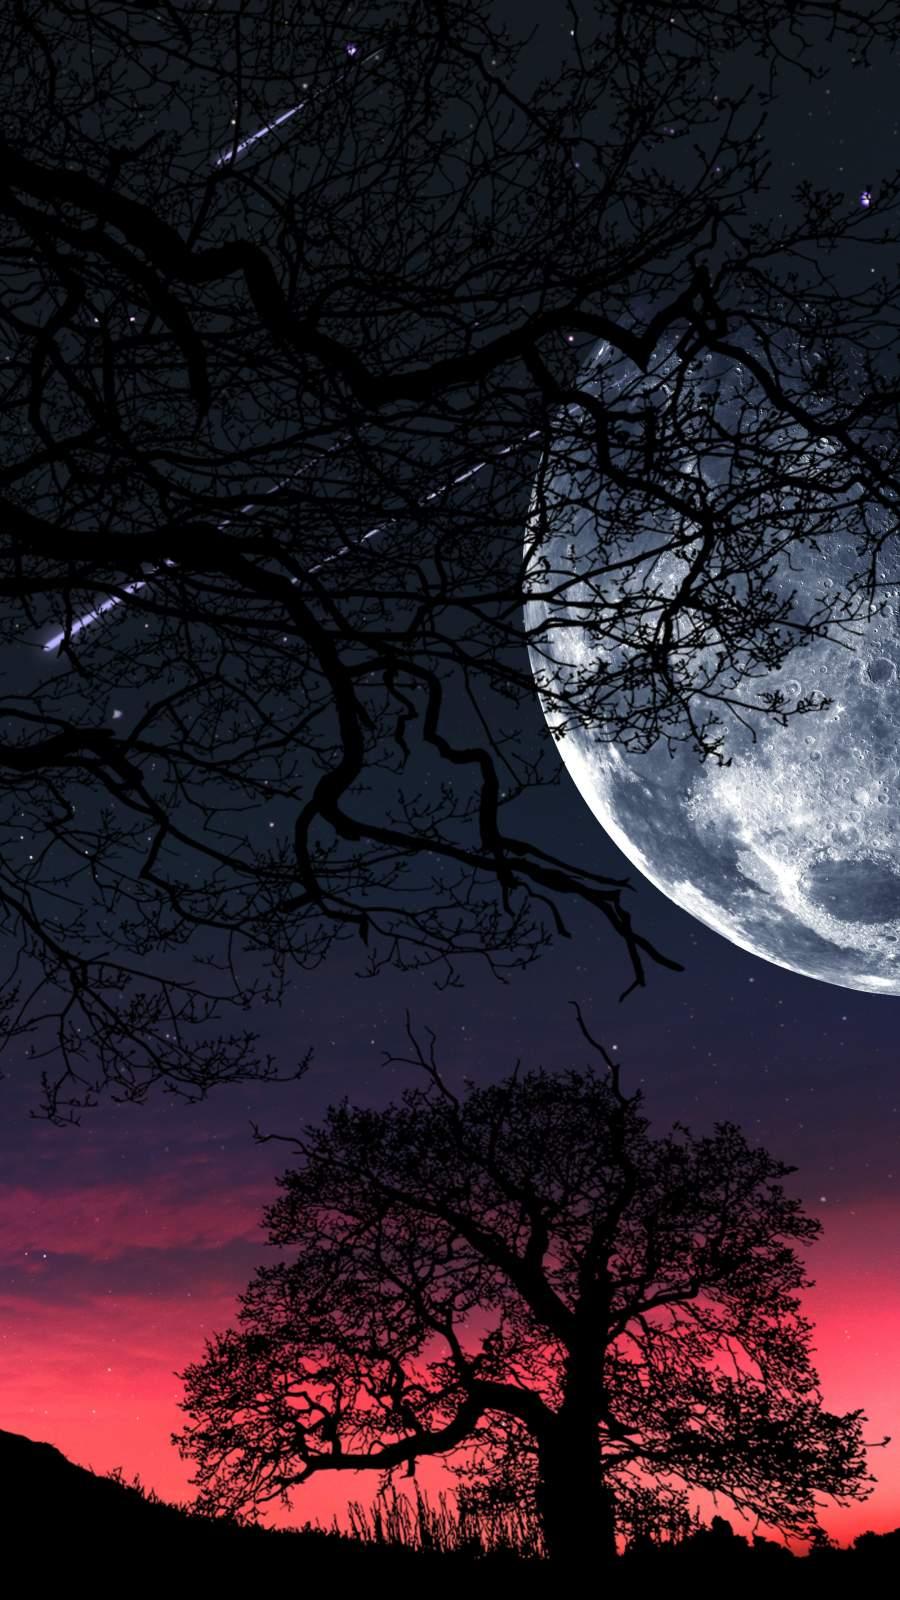 Moon Tree Silhouette